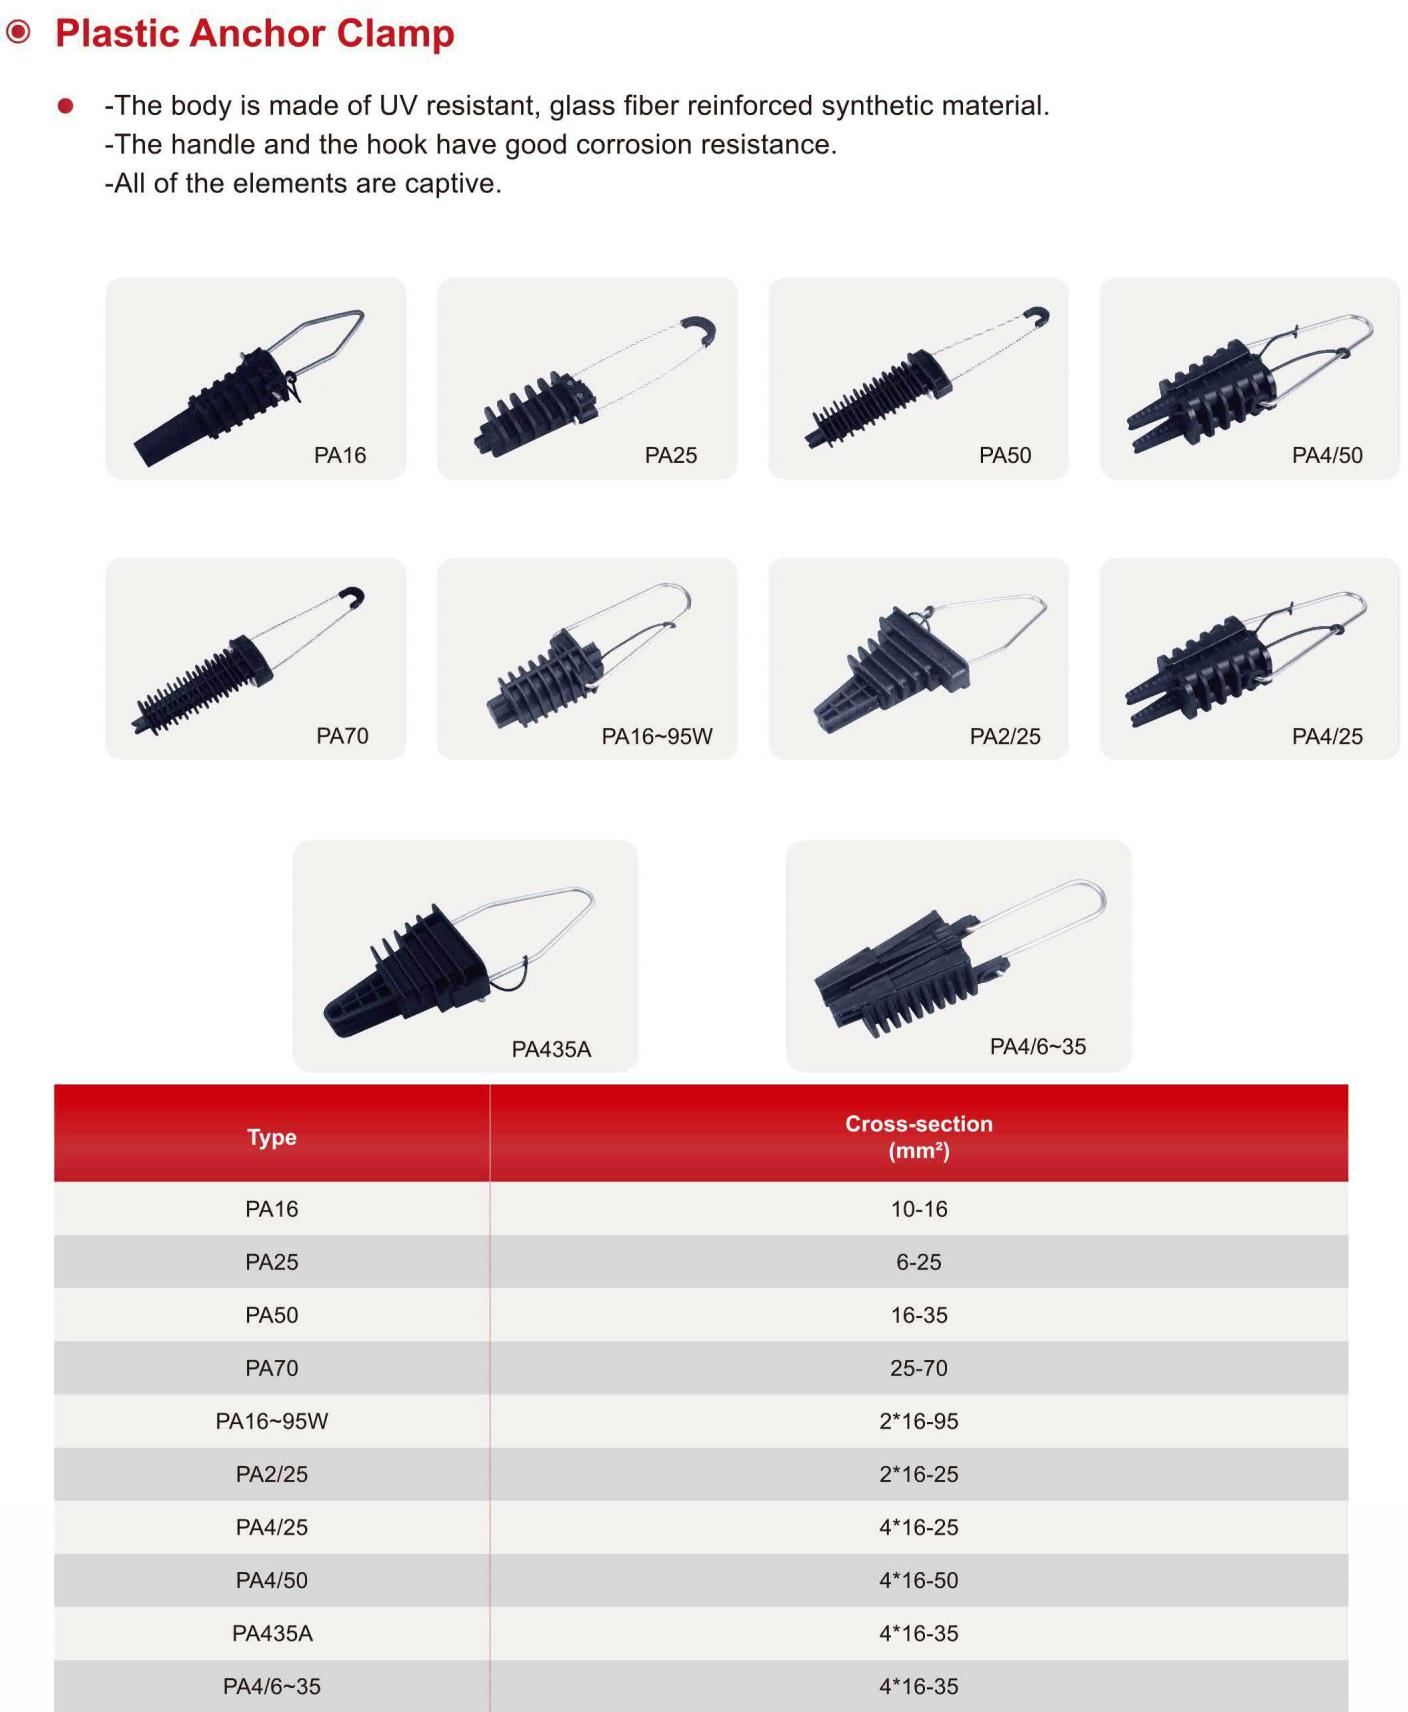 plastic anchor clamp description.jpg